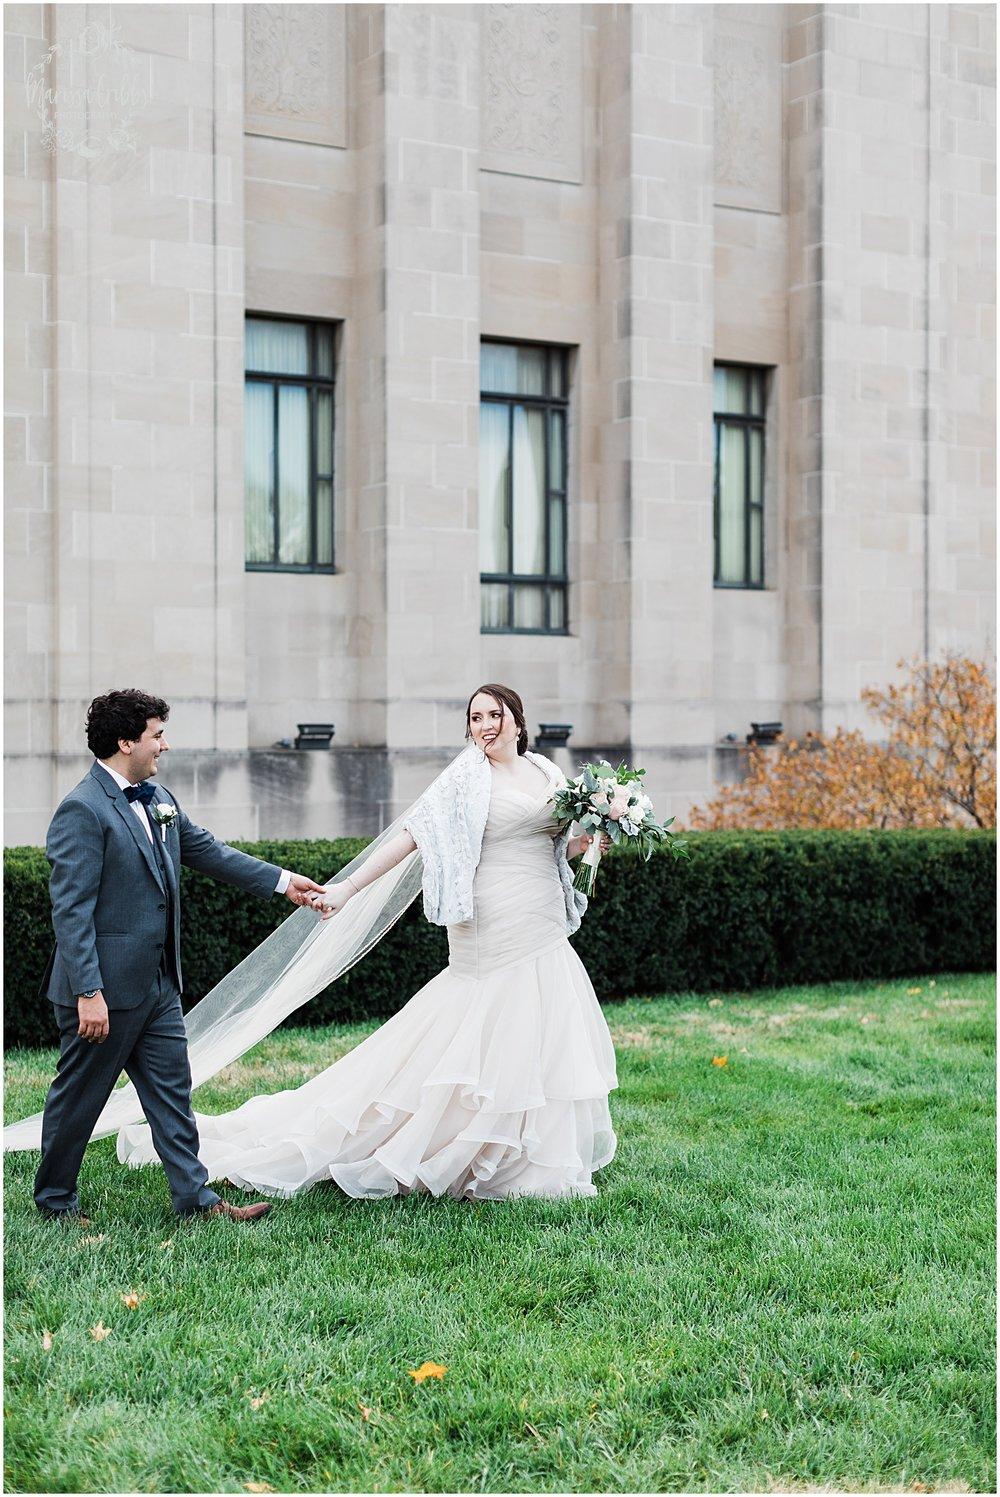 JULIA & AUSTIN MADRID THEATRE WEDDING | MARISSA CRIBBS PHOTOGRAPHY_7099.jpg